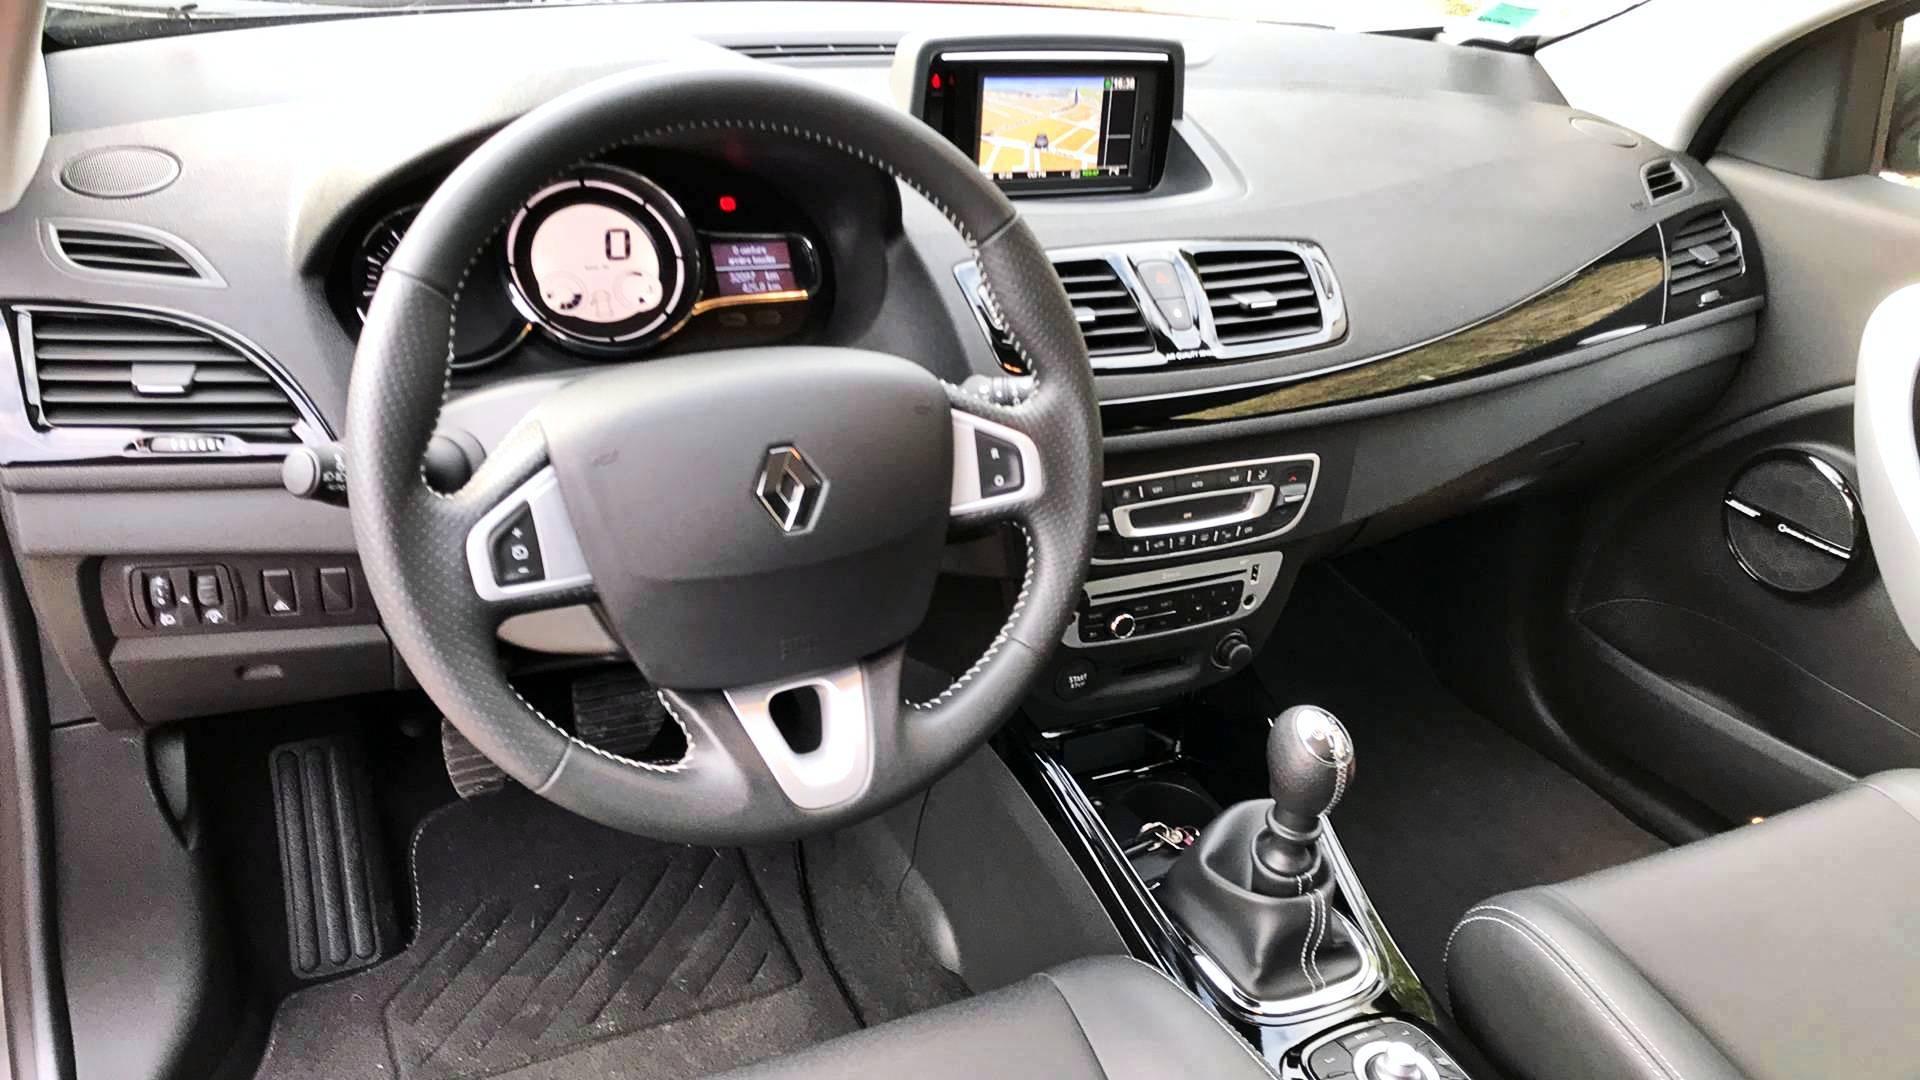 Renault megane d 39 occasion coupe 1 4 tce 130 bose le mans for Garage renault occasion le mans